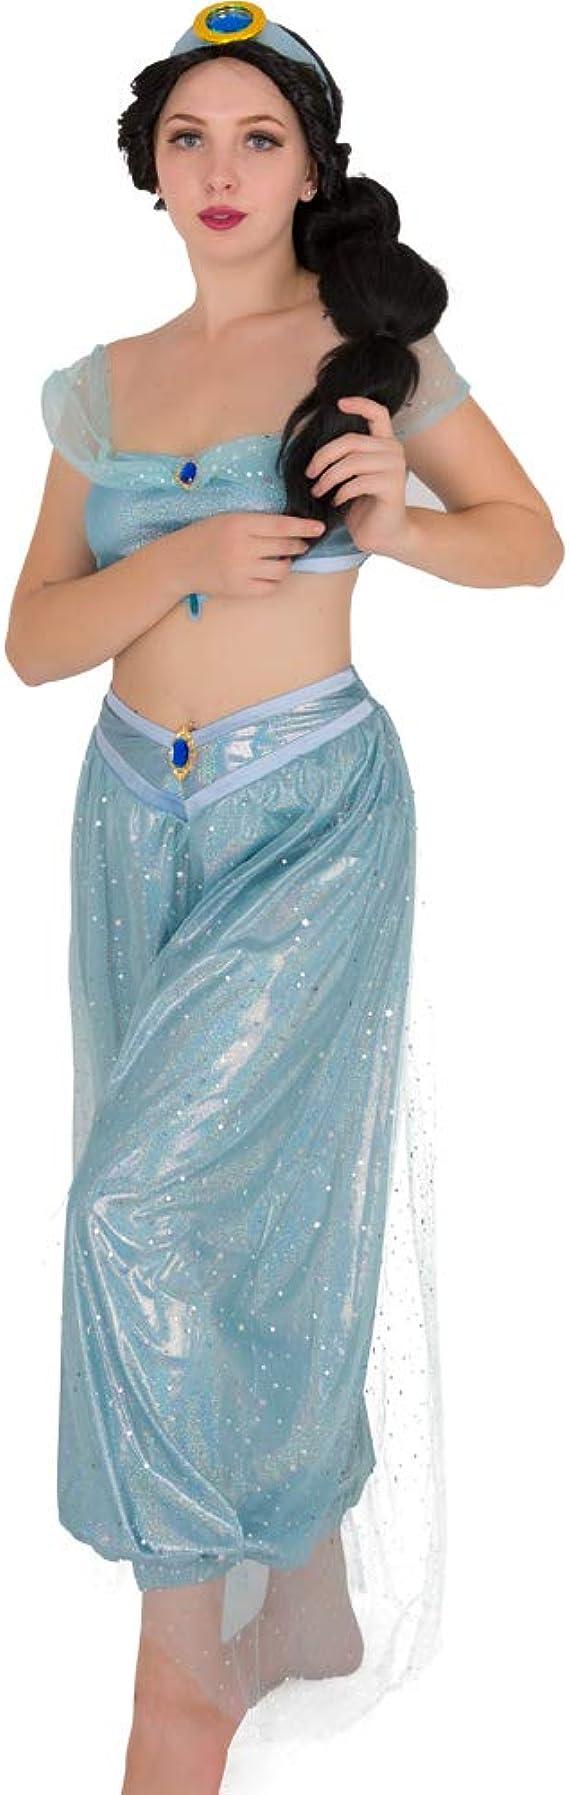 Amazon.com: Cosplay.fm - Disfraz de princesa árabe para ...